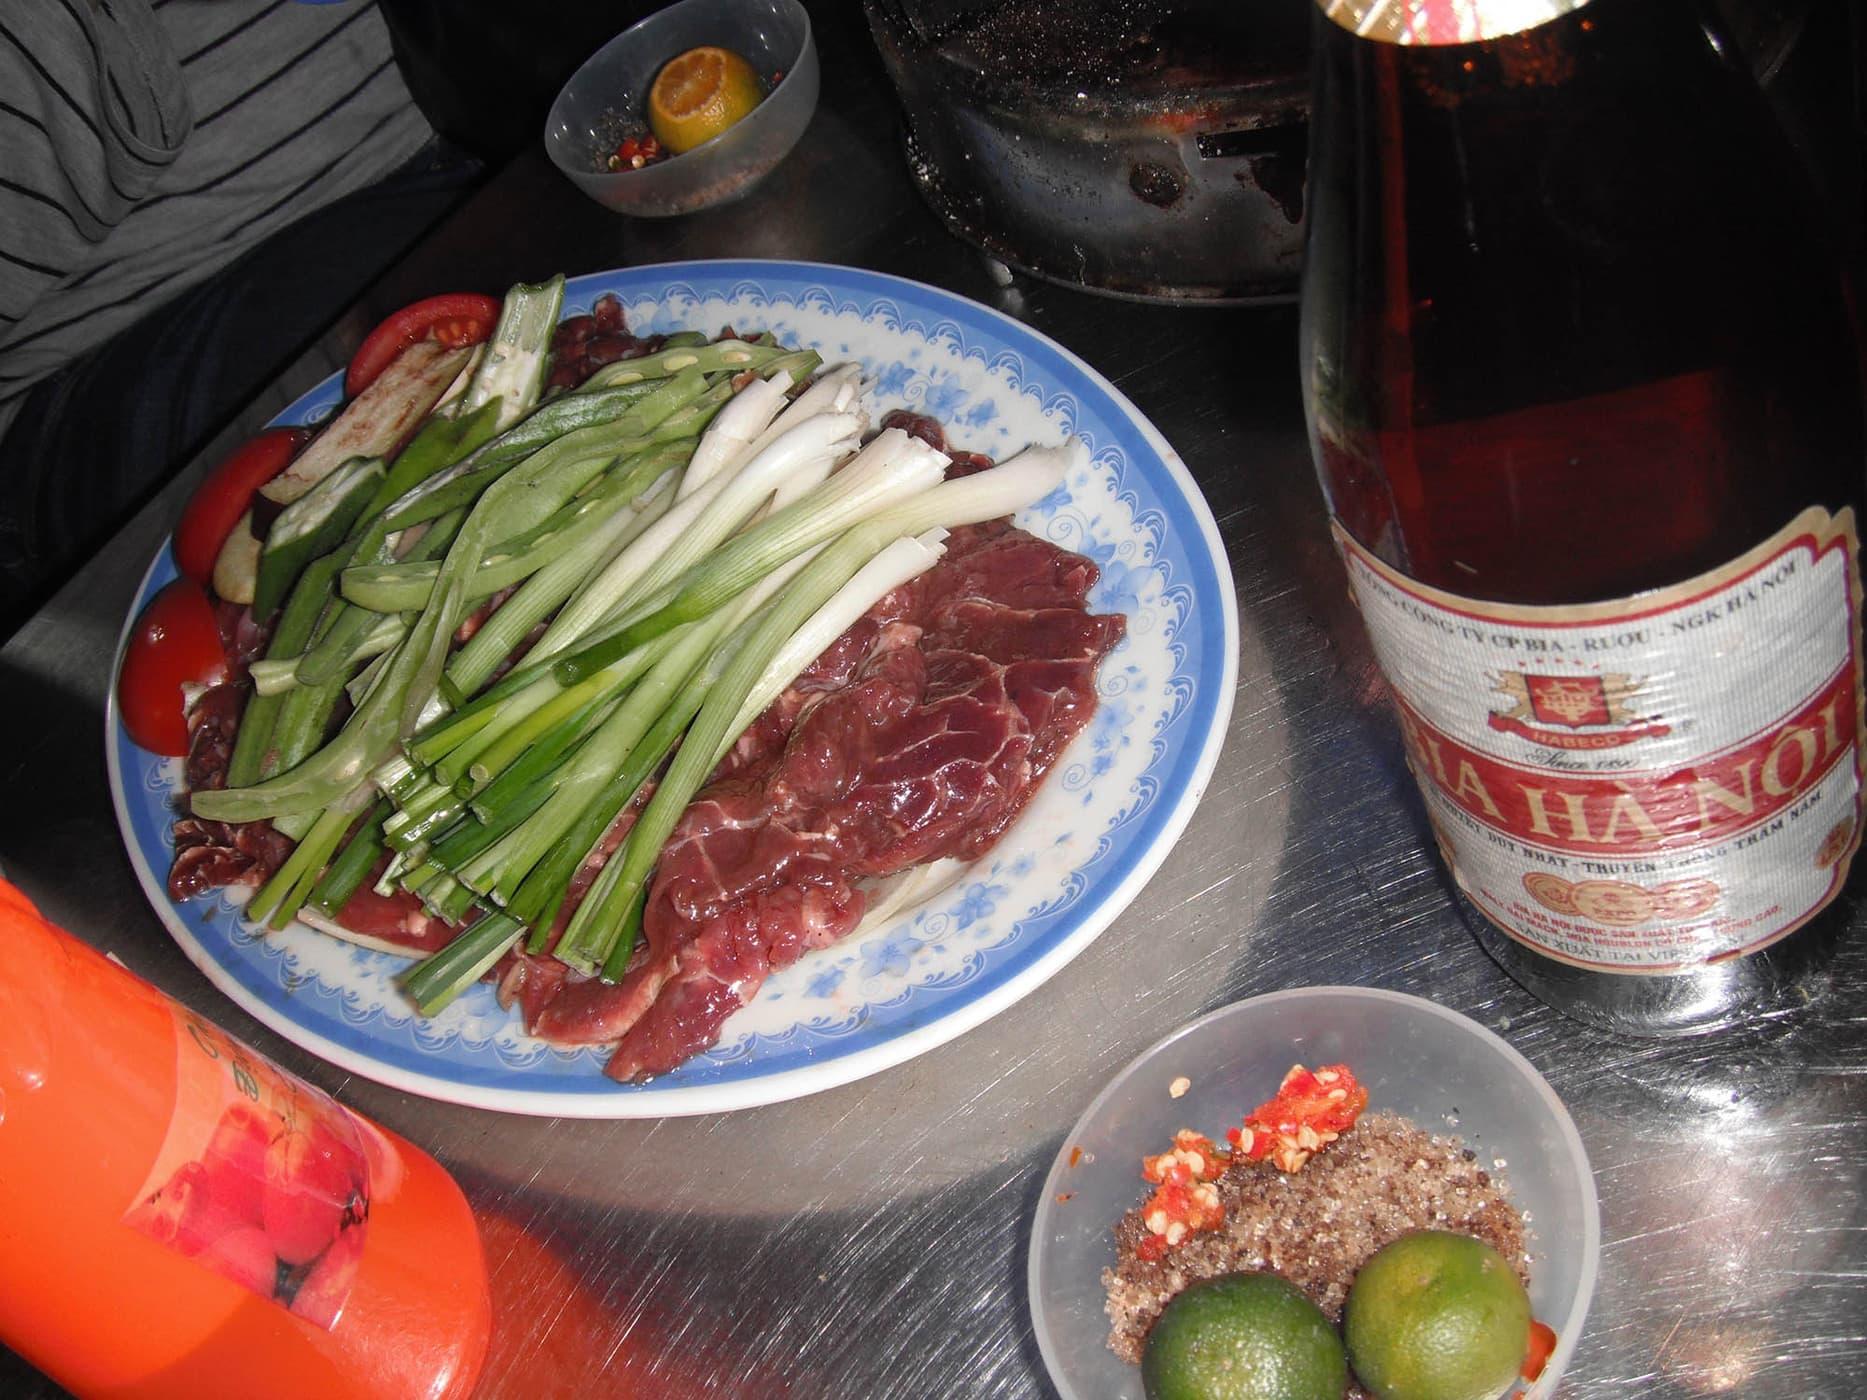 Celebrating six months of travel in Hanoi, Vietnam. - Street food in Hanoi, Vietnam